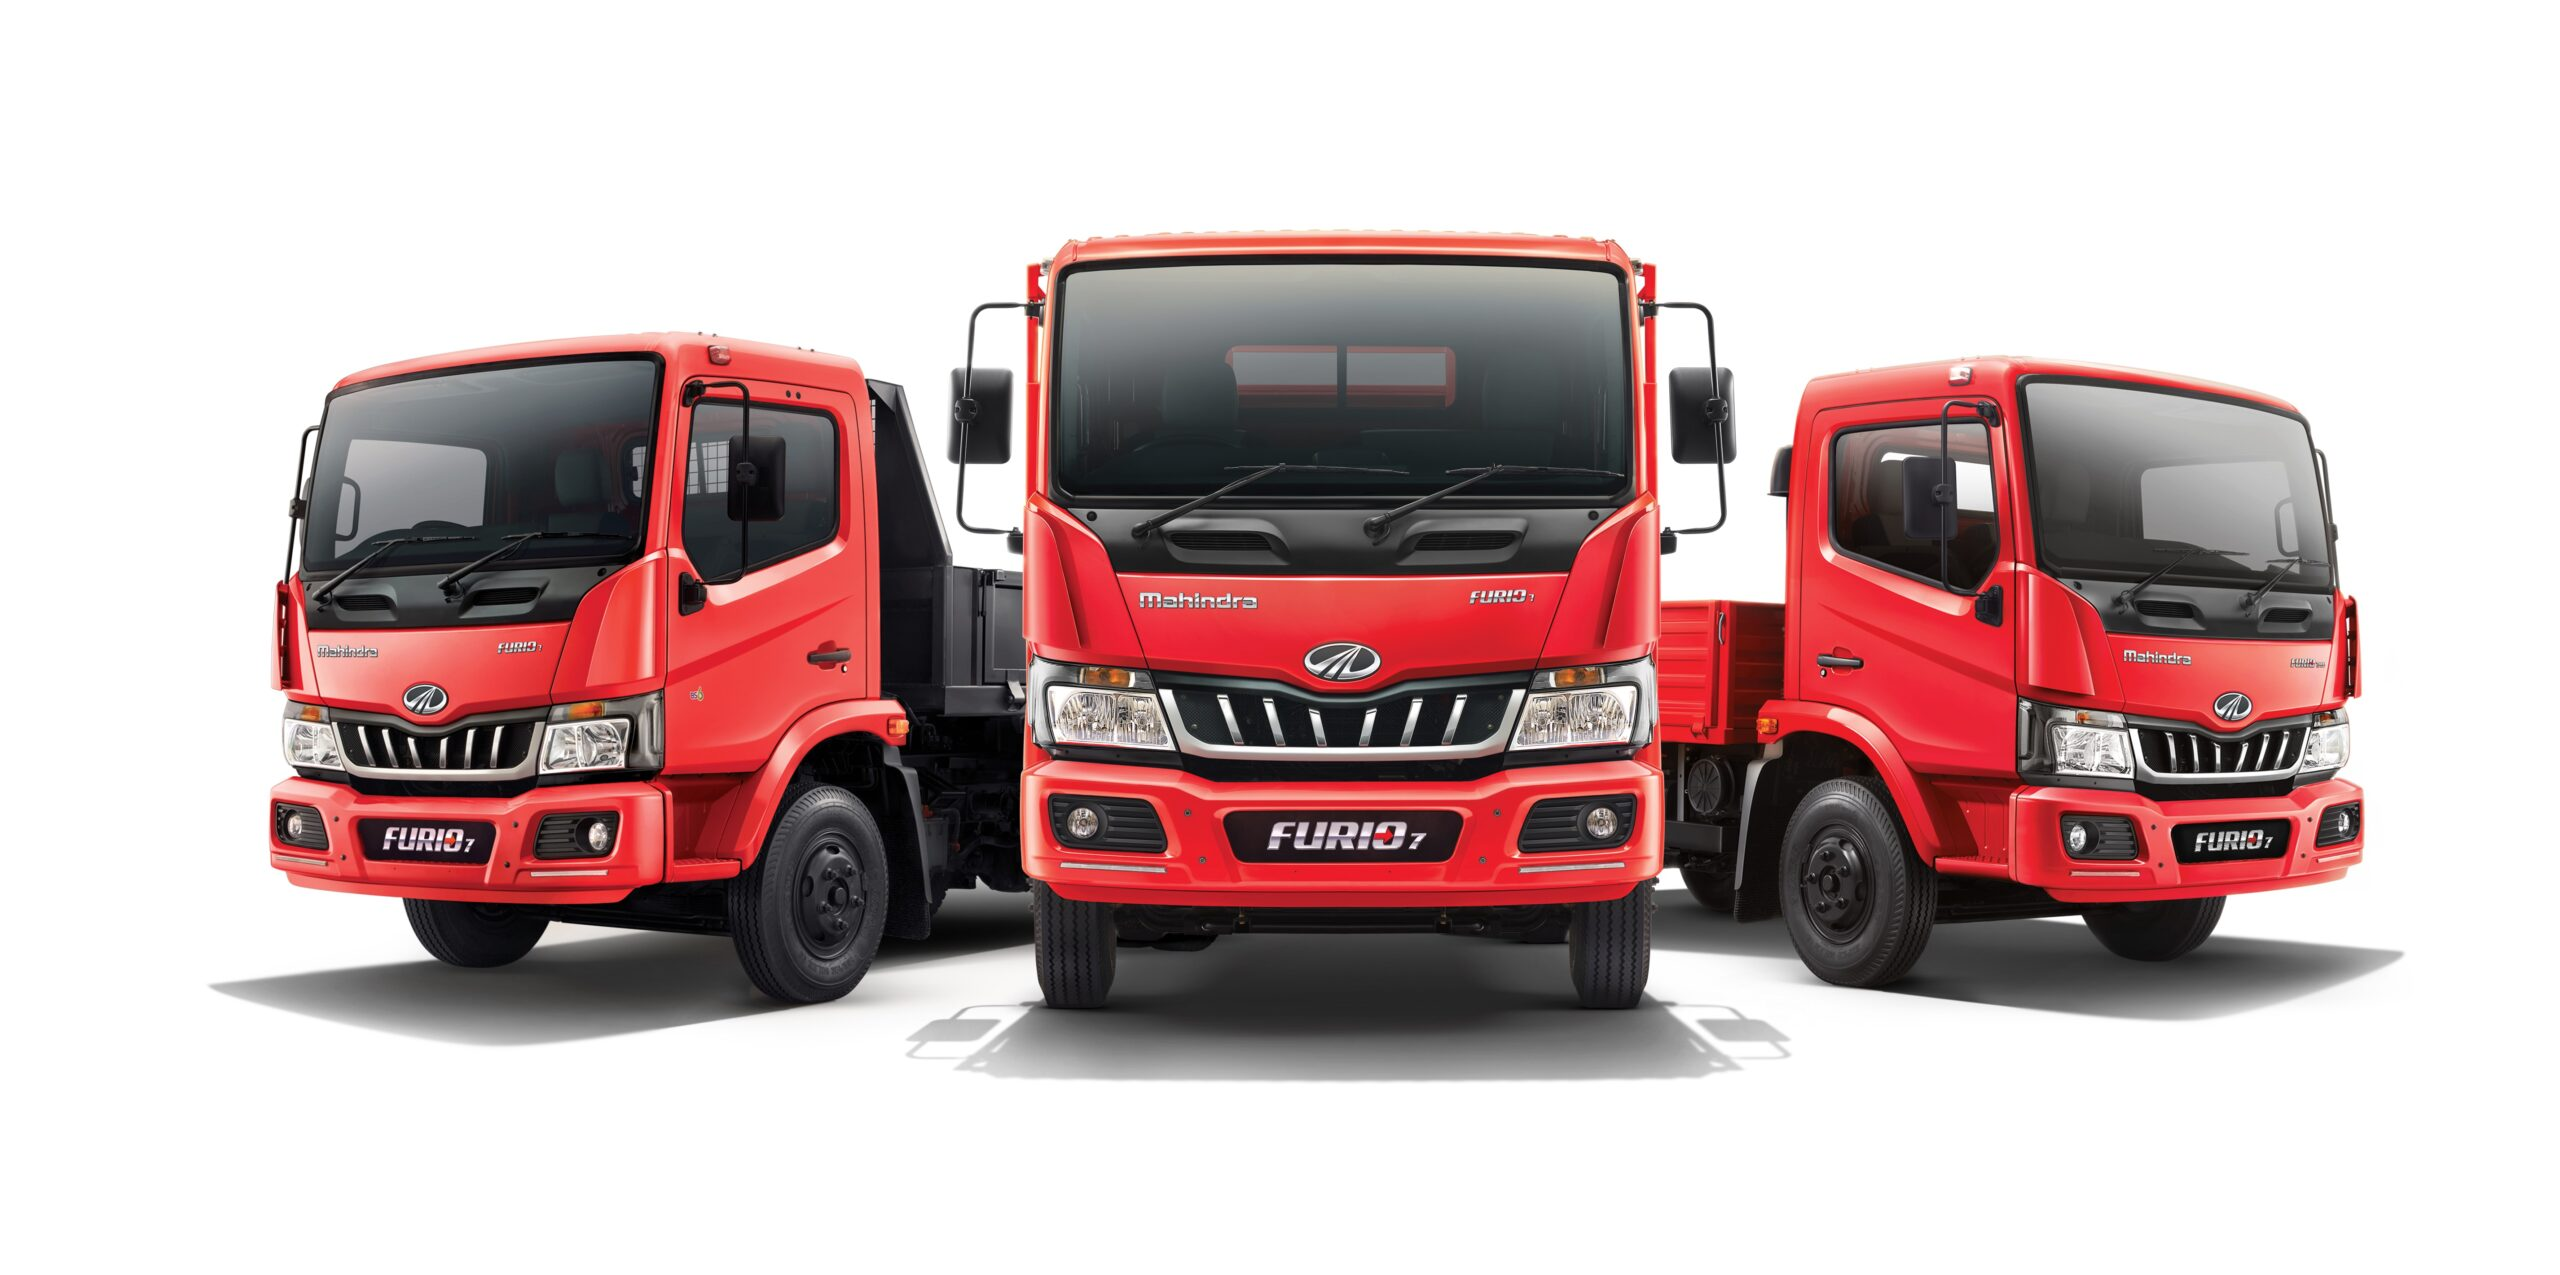 Mahindra Launches the All New FURIO 7 range of LCV Trucks